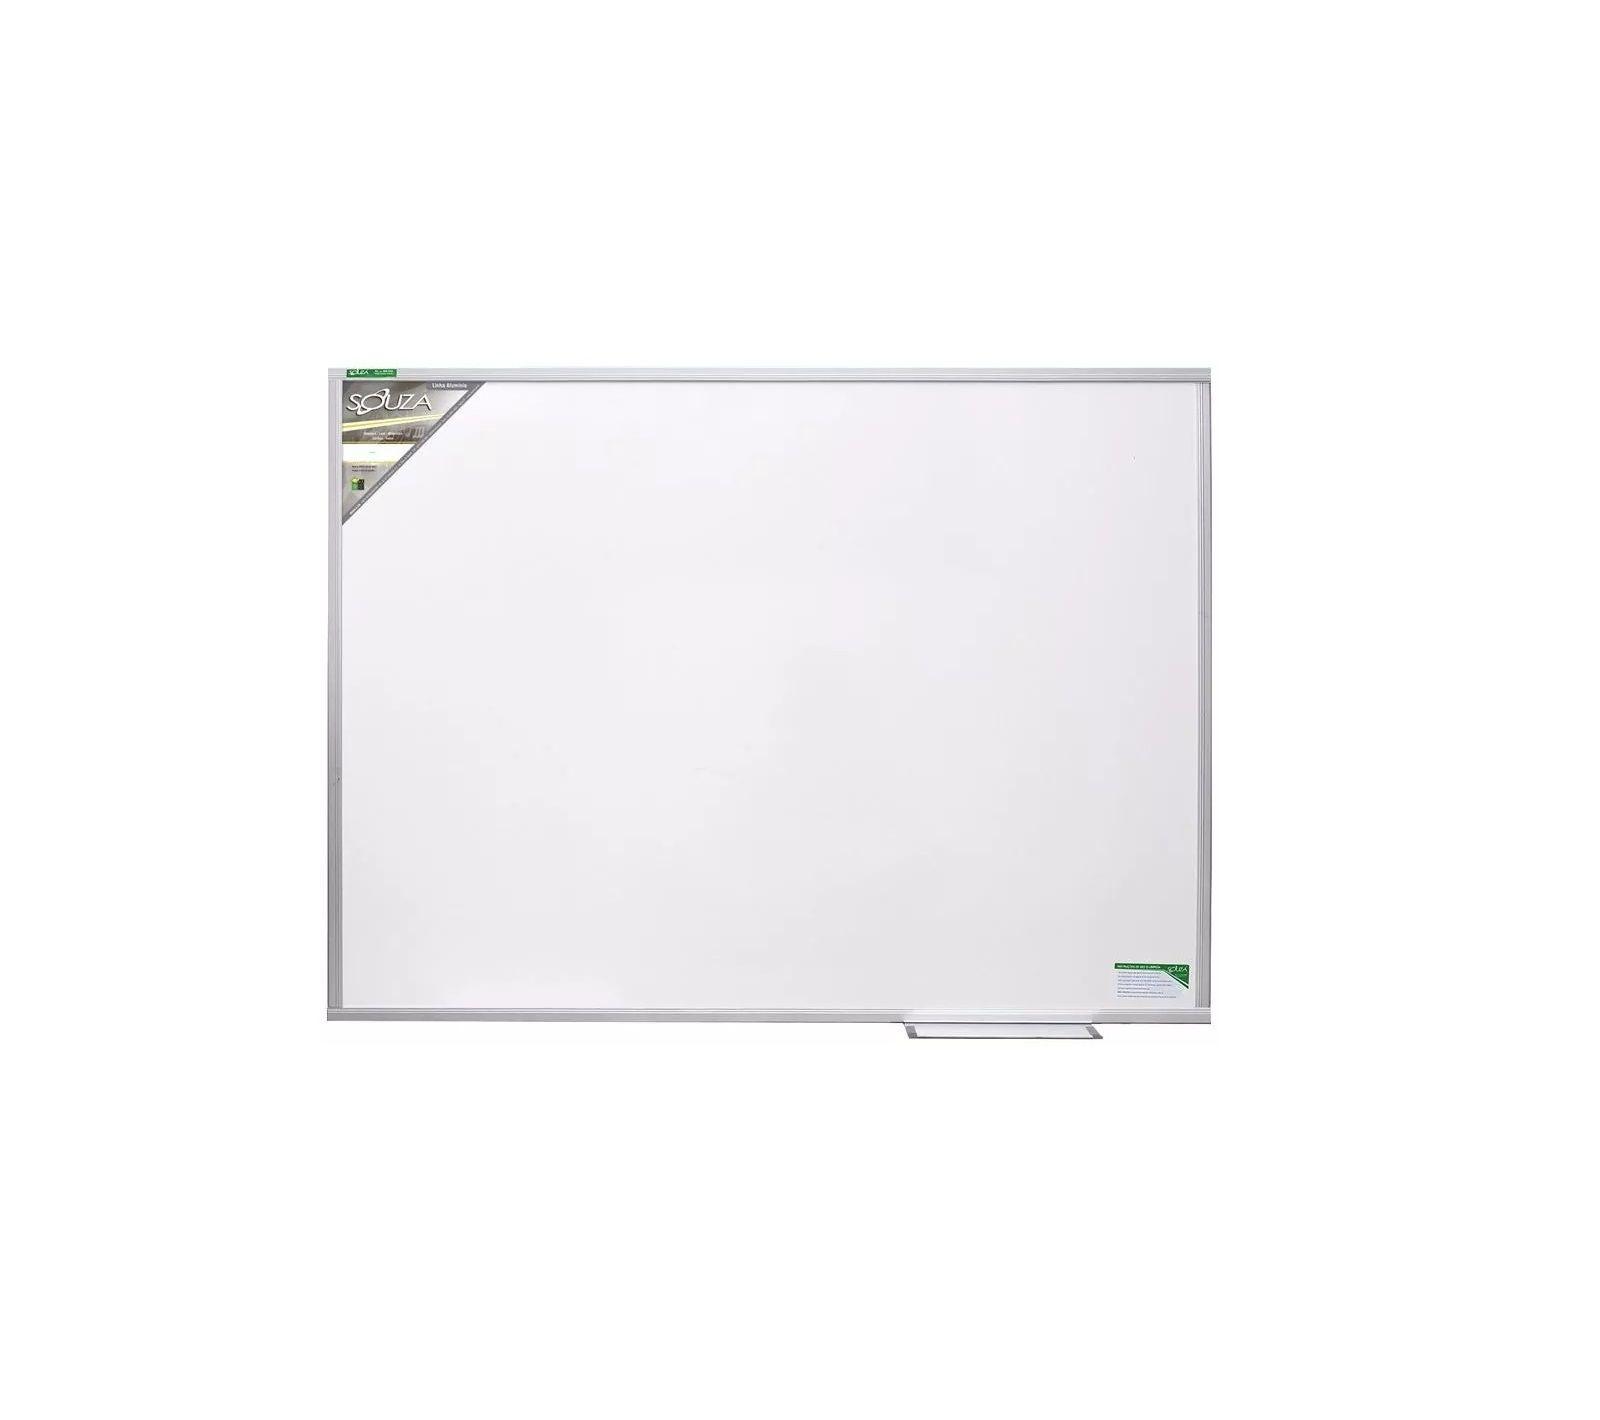 Quadro Branco Luxo (Base Fórmica + MDF) 90x60 cm Moldura Alumínio Pop Referência 5620 - Souza